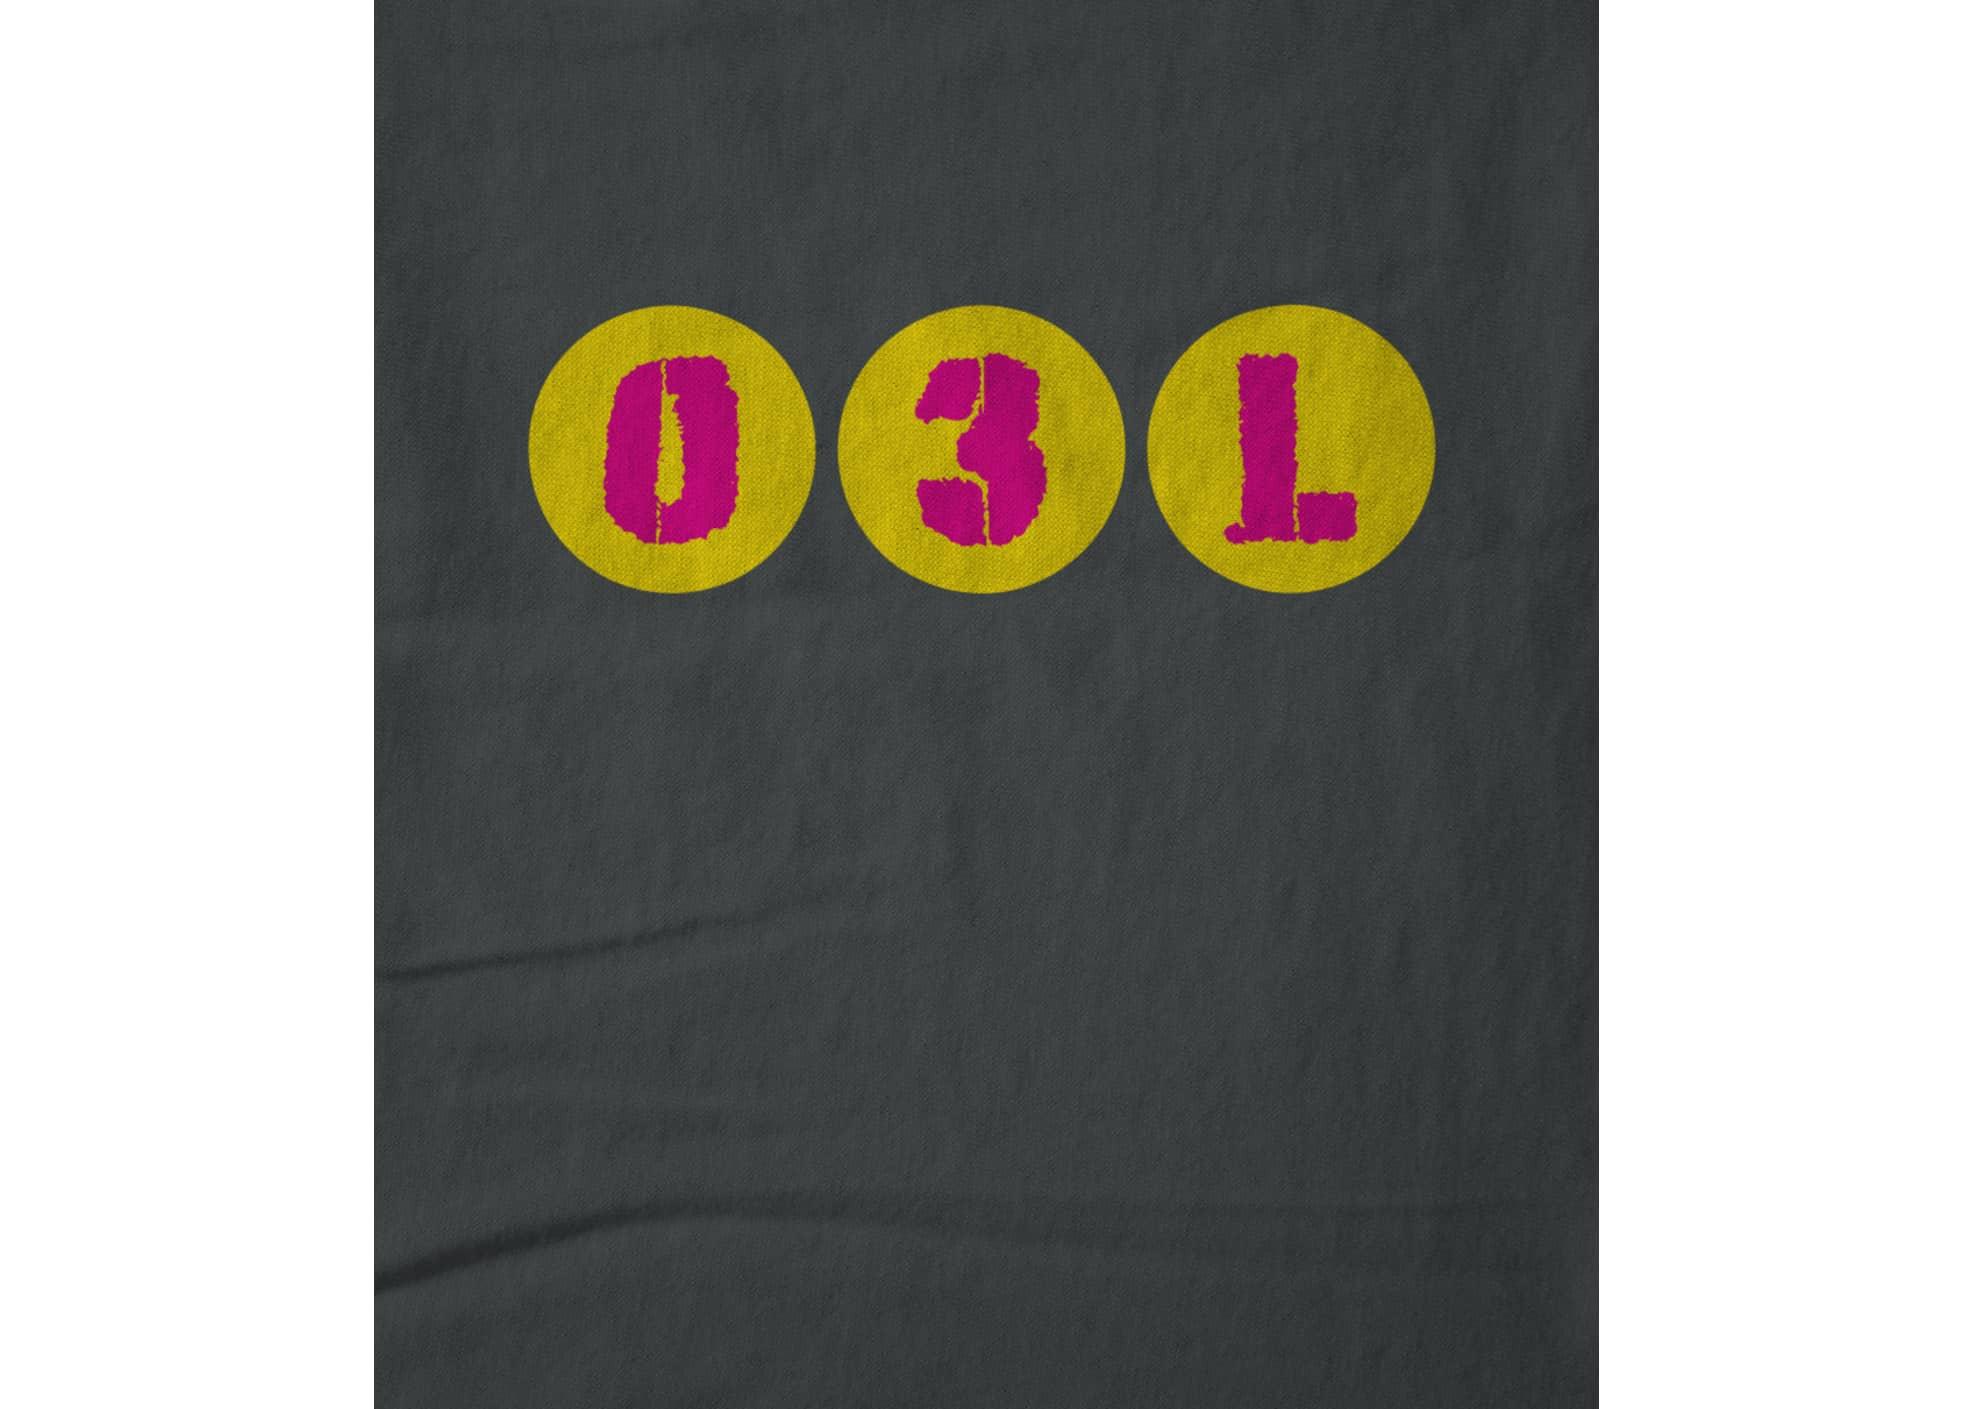 Only three lads o3l podcast   logo design 2  asphalt  1579509236